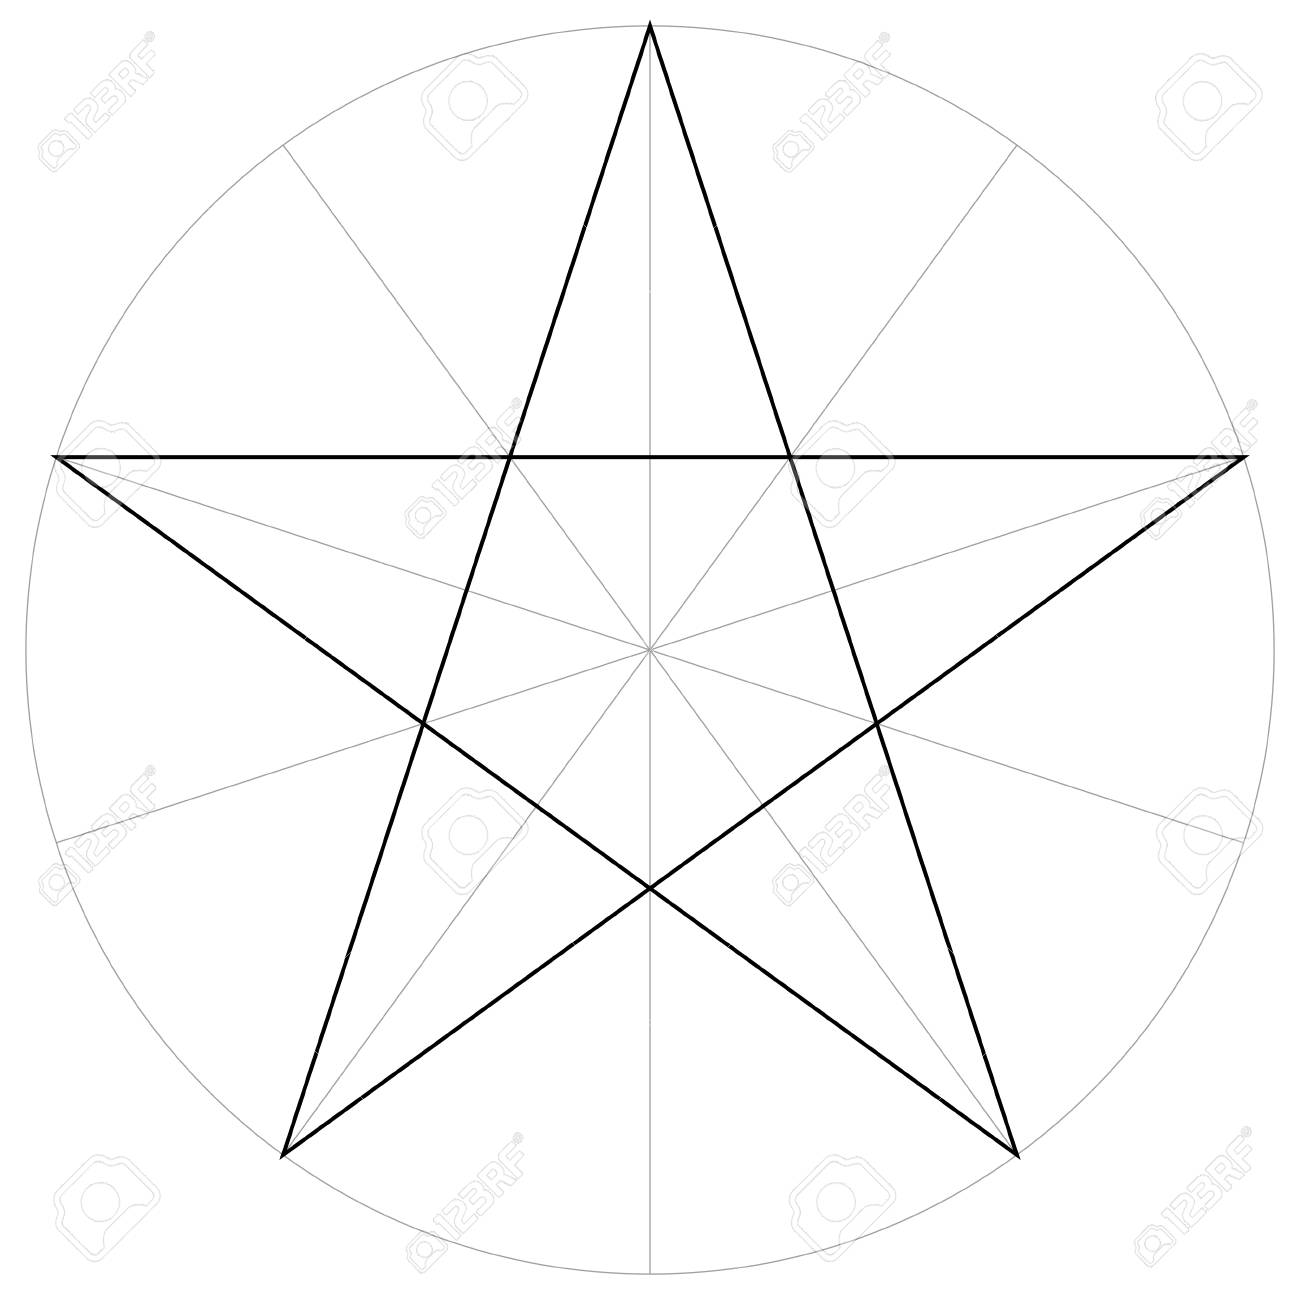 correct form shape template of the geometric shape of the pentagram